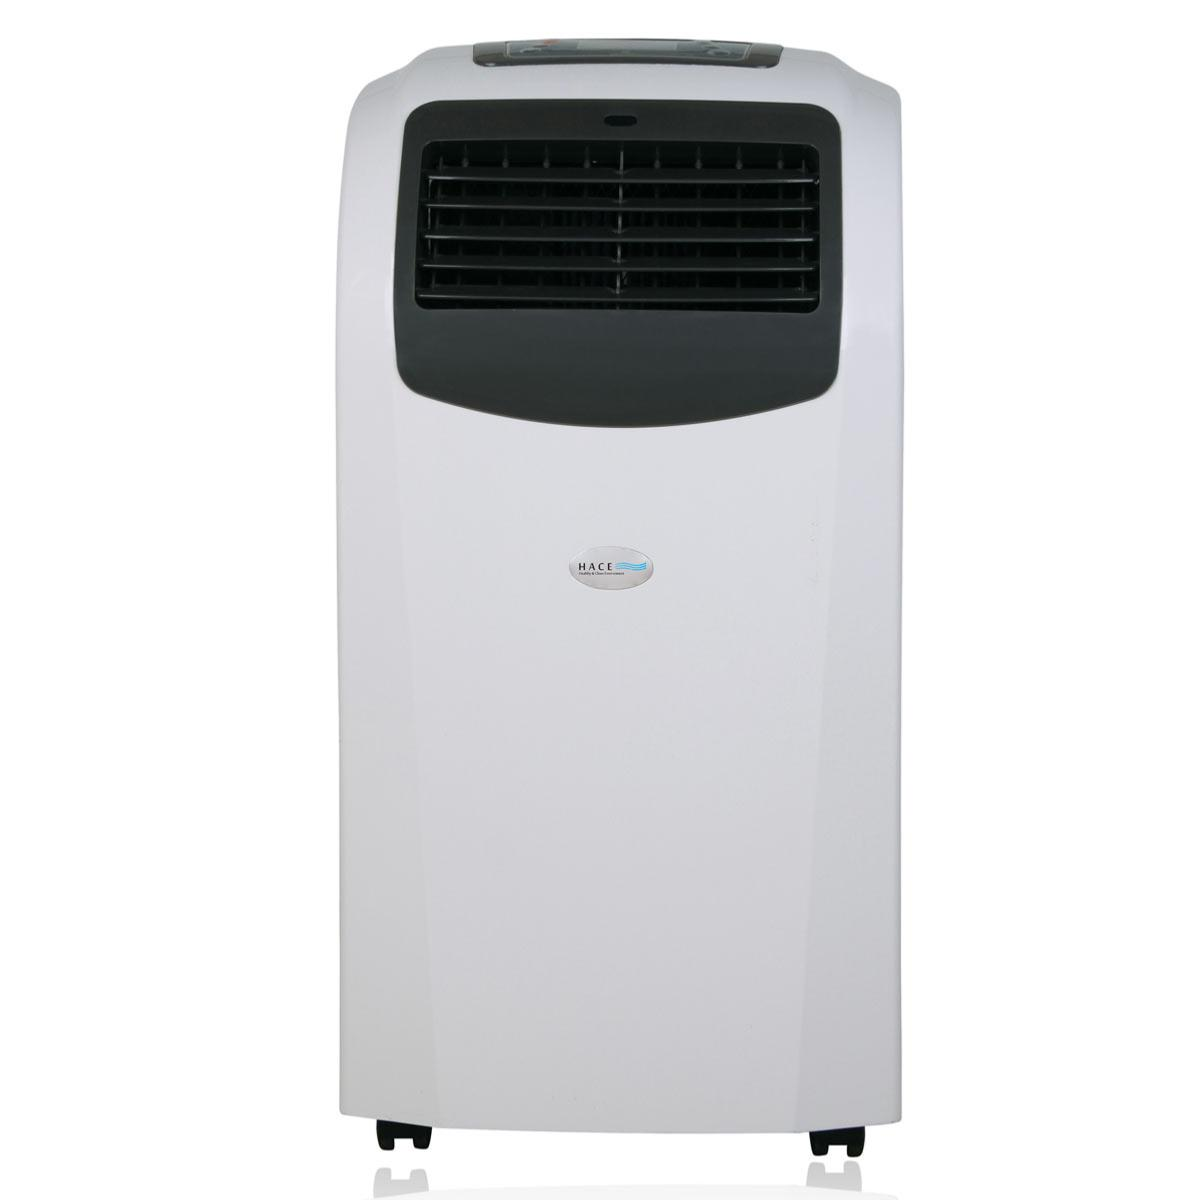 Aire acondicionado portatil hace modelo cb17 de 4250 frig h for Consumo aire acondicionado portatil